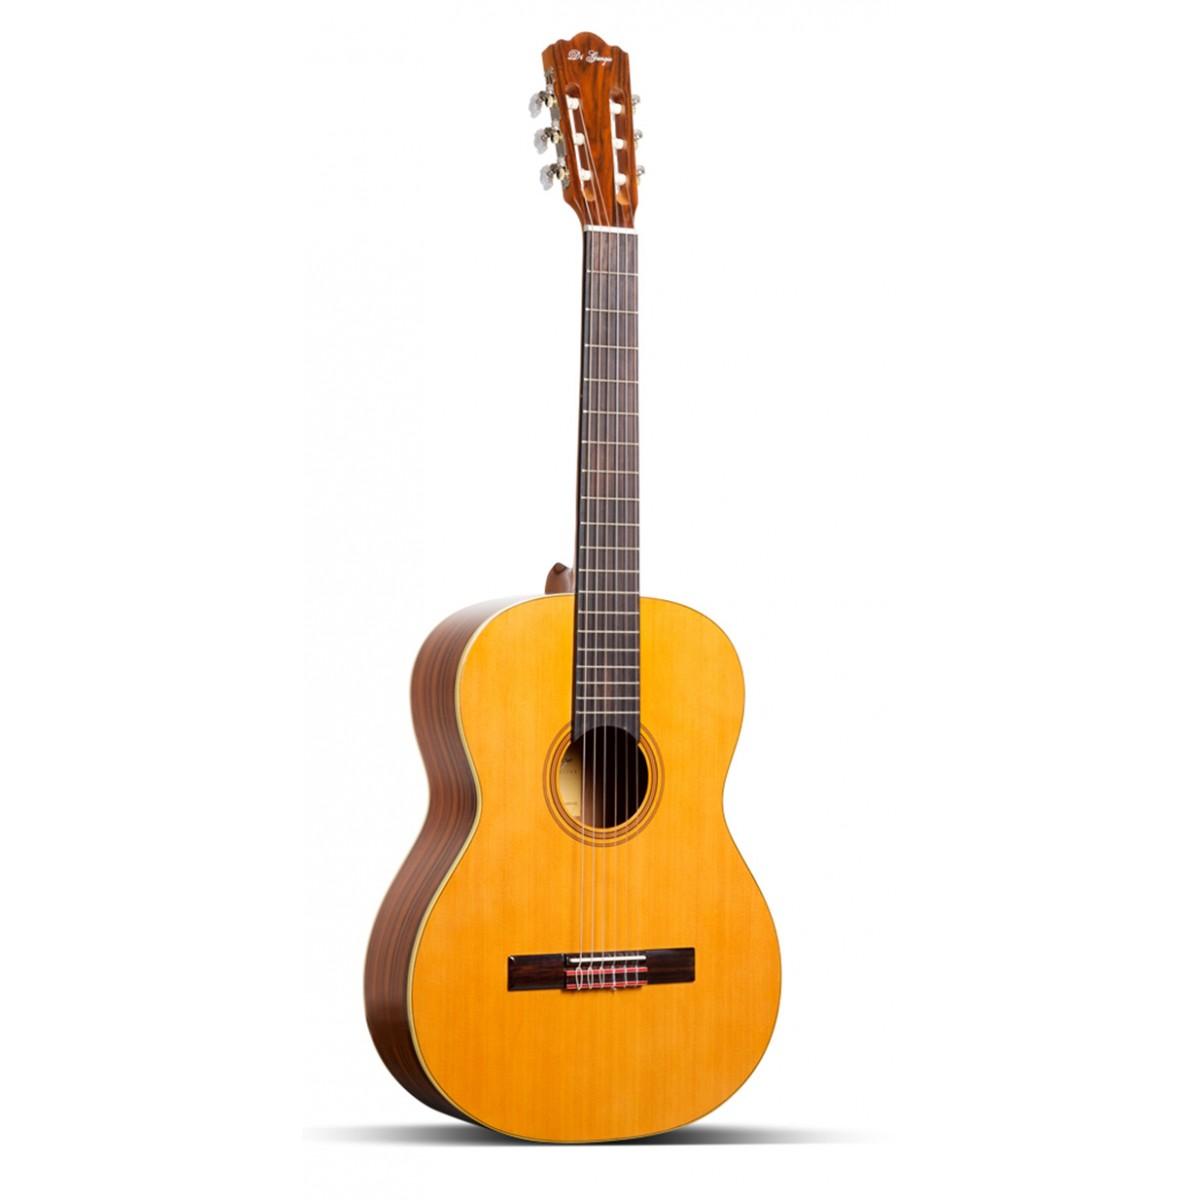 Violão Di Giorgio 18 - Musical Perin